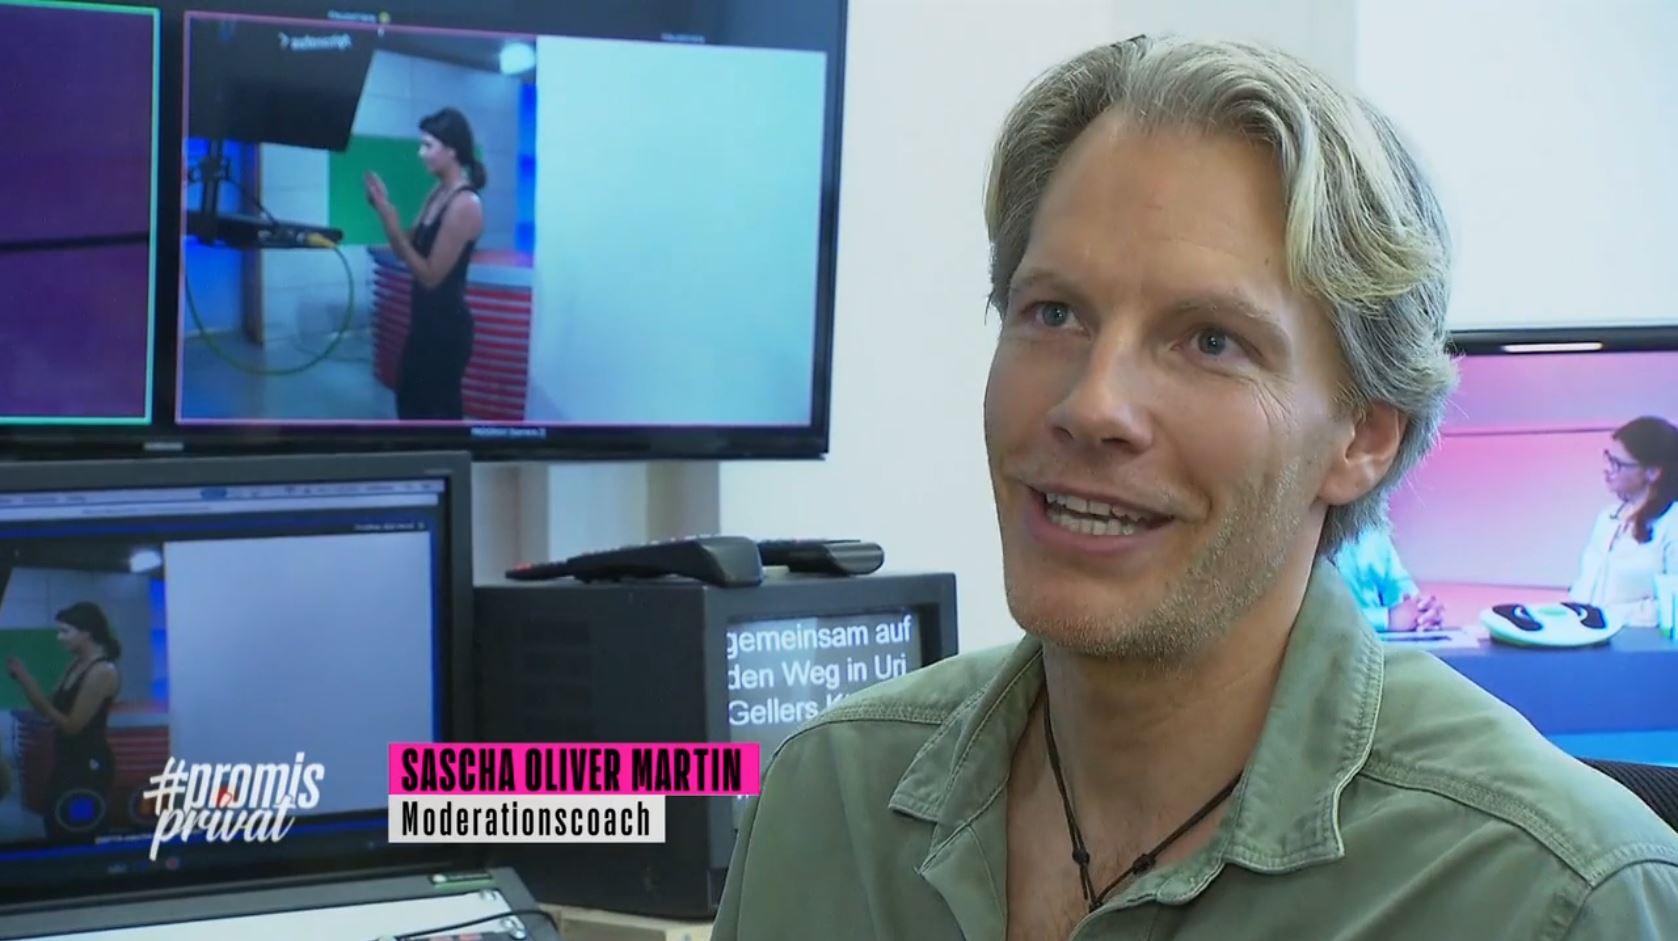 TV-Moderator und TV-Coach Sascha Oliver Martin